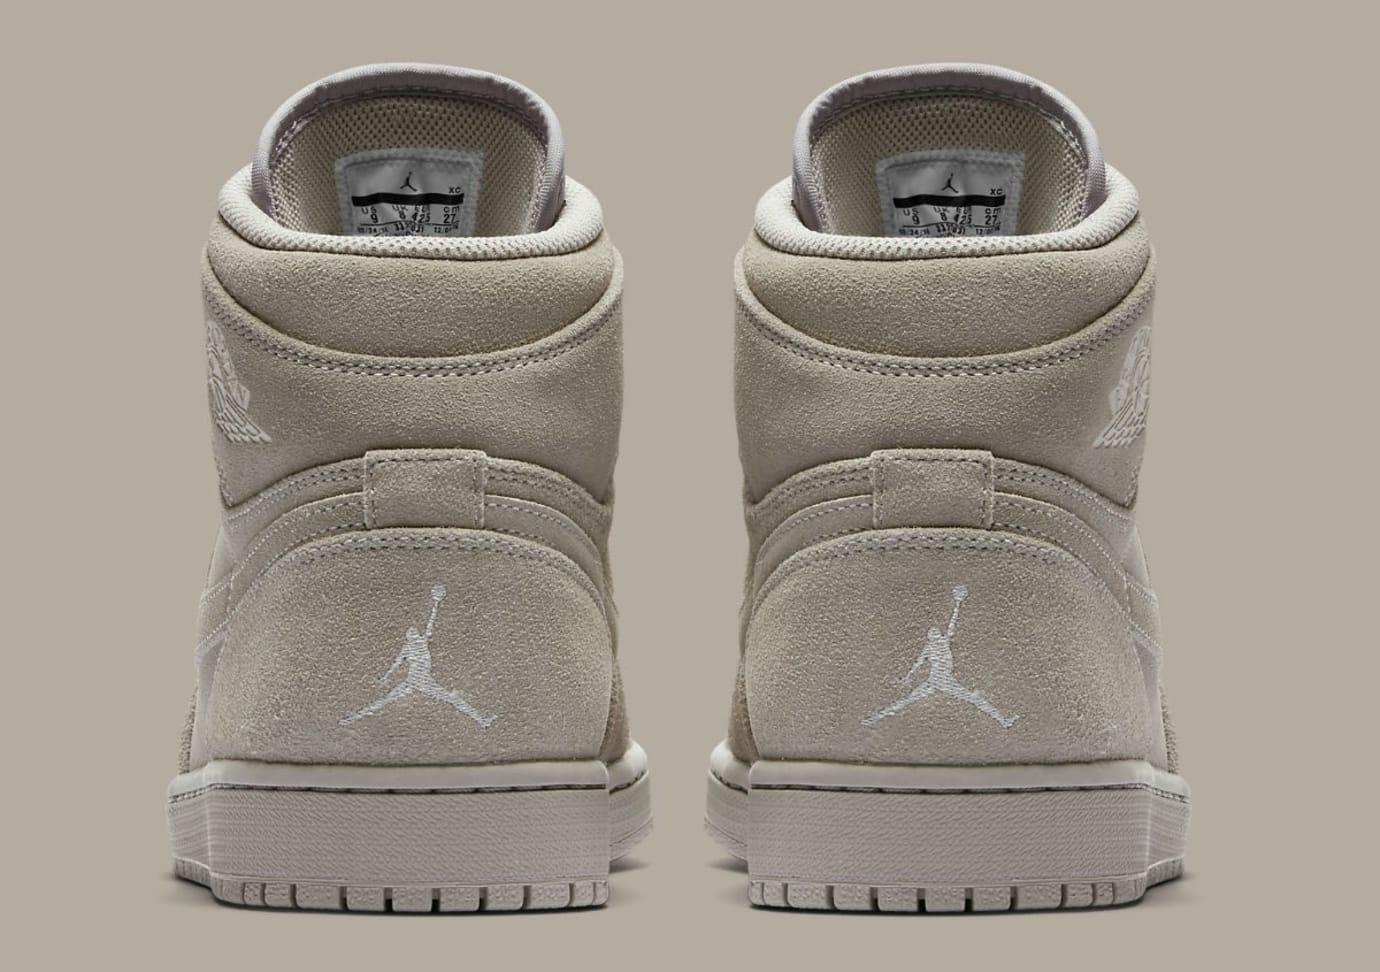 b2c91f5bc3d802 Air Jordan 1 High Wolf Grey Suede Release Date Heel 332550-031